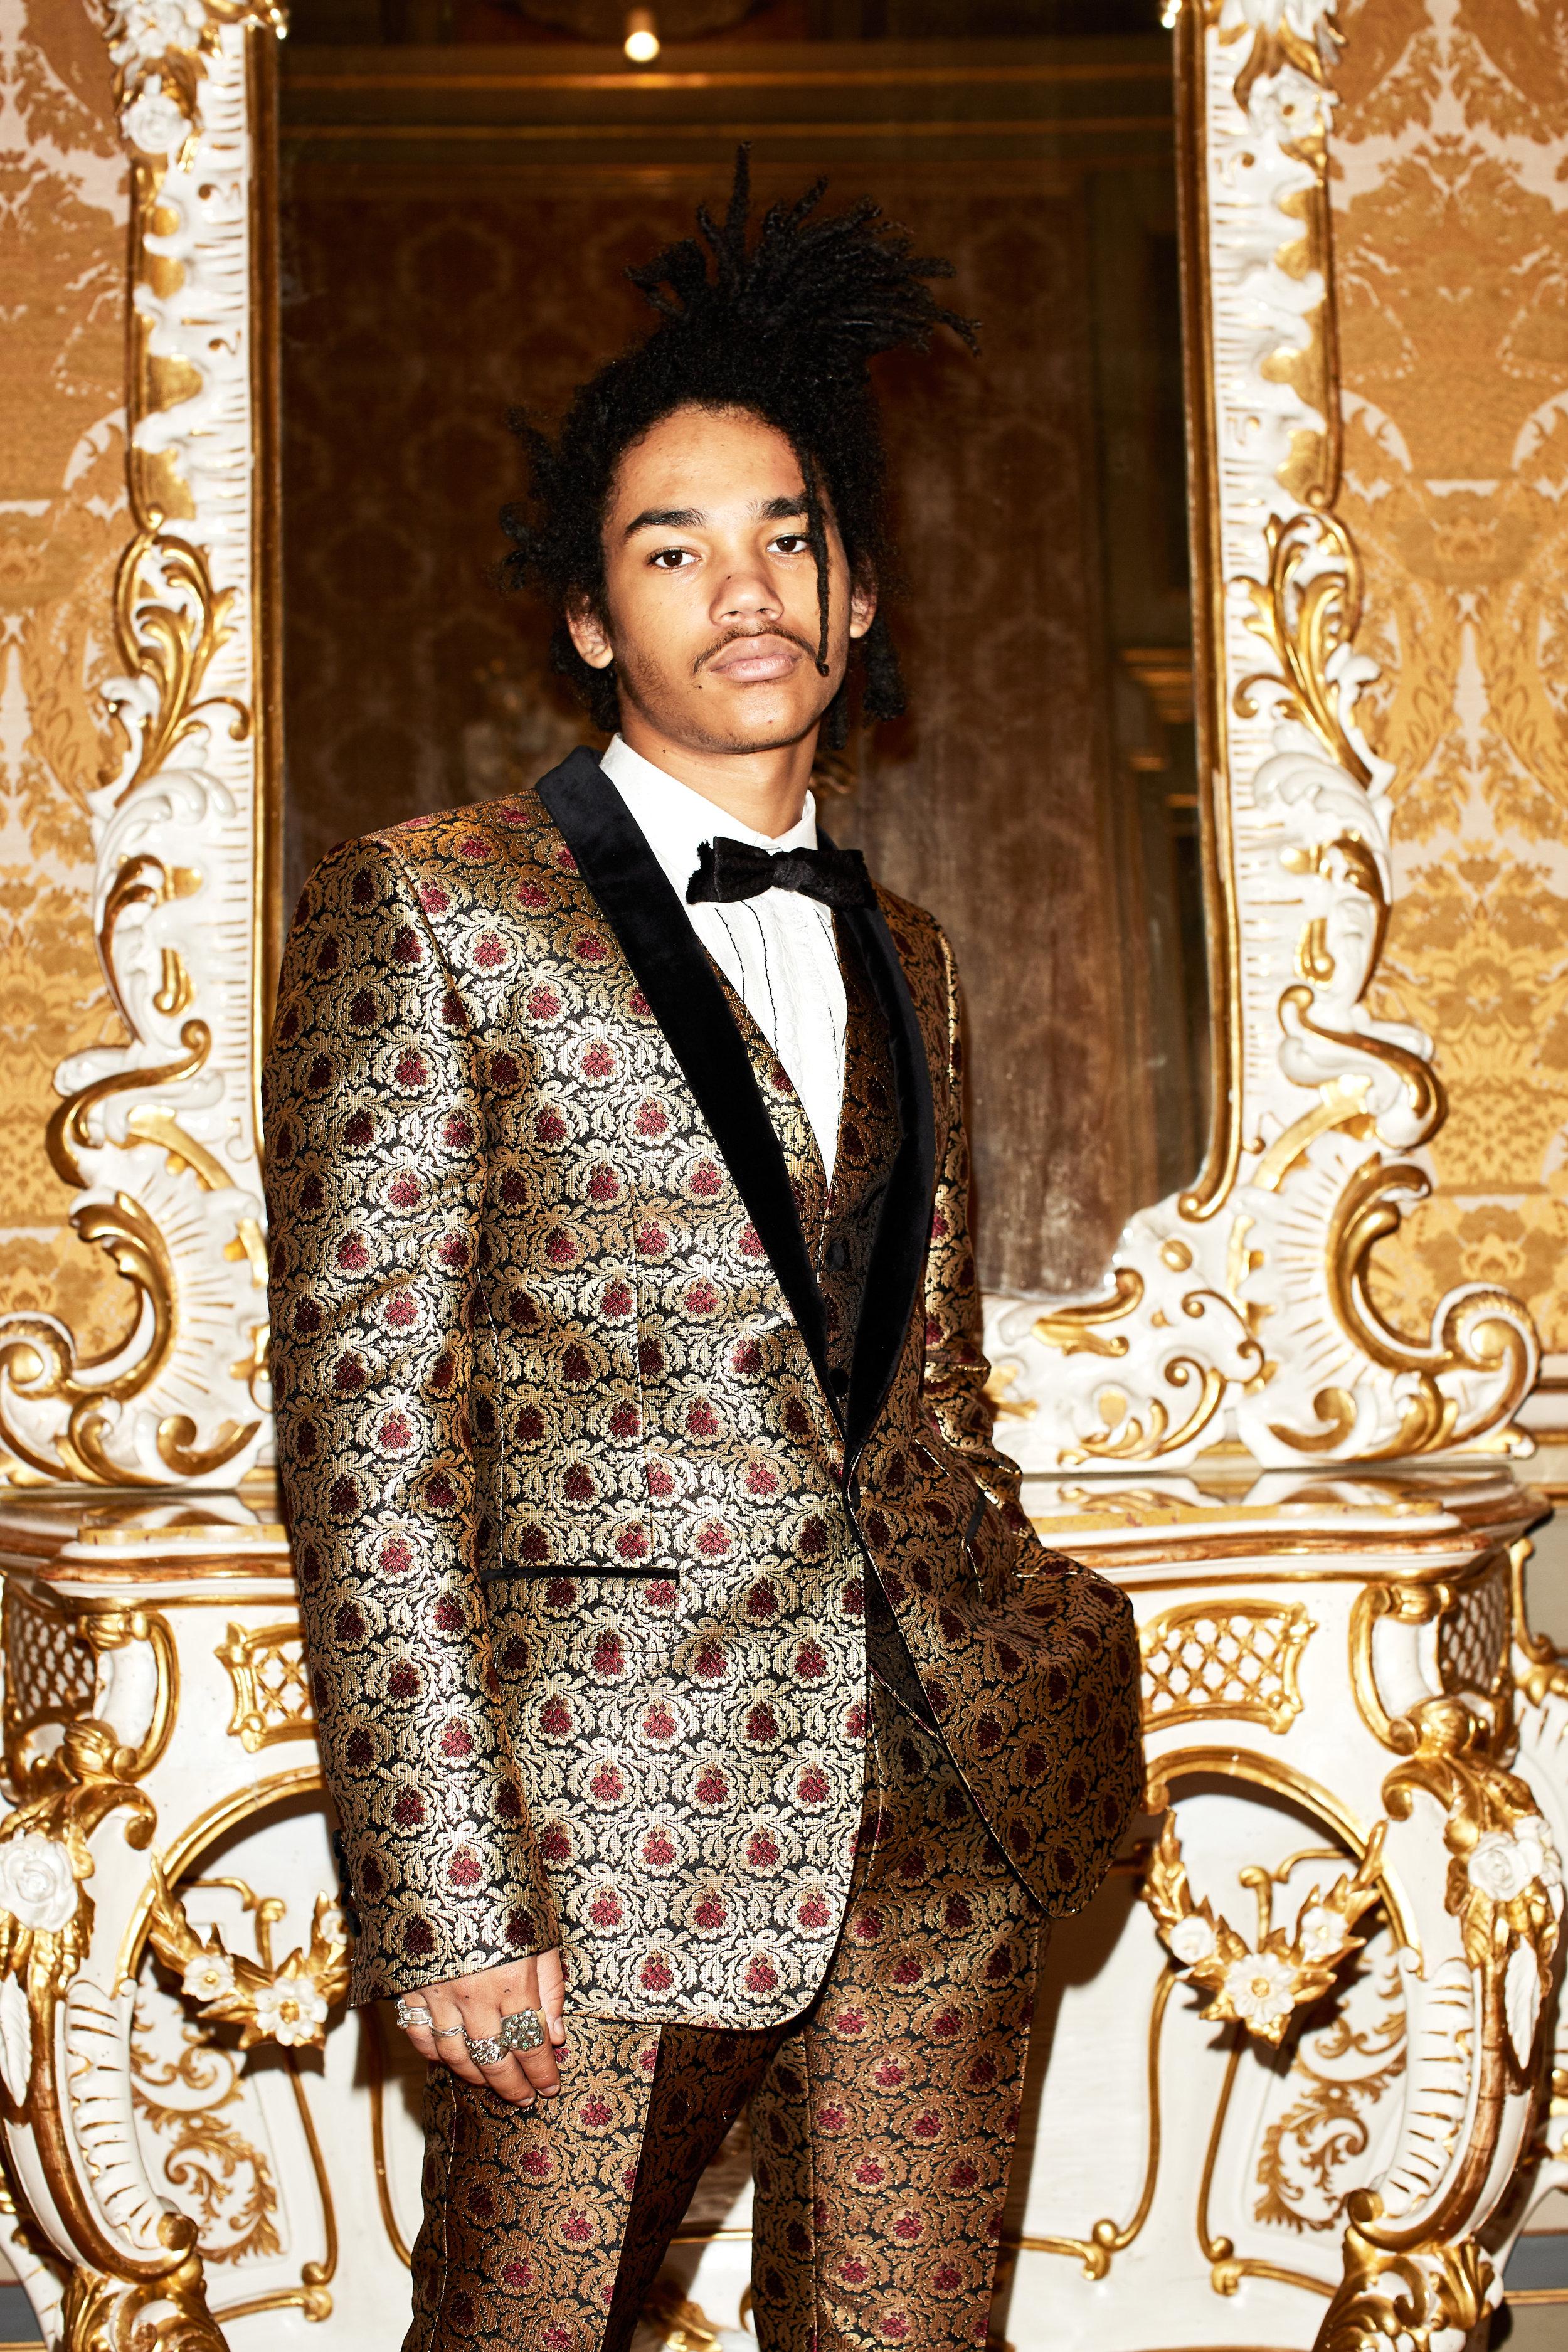 Shot177-Dolce&Gabbana-ManLookBook-FW1718_1851.jpg